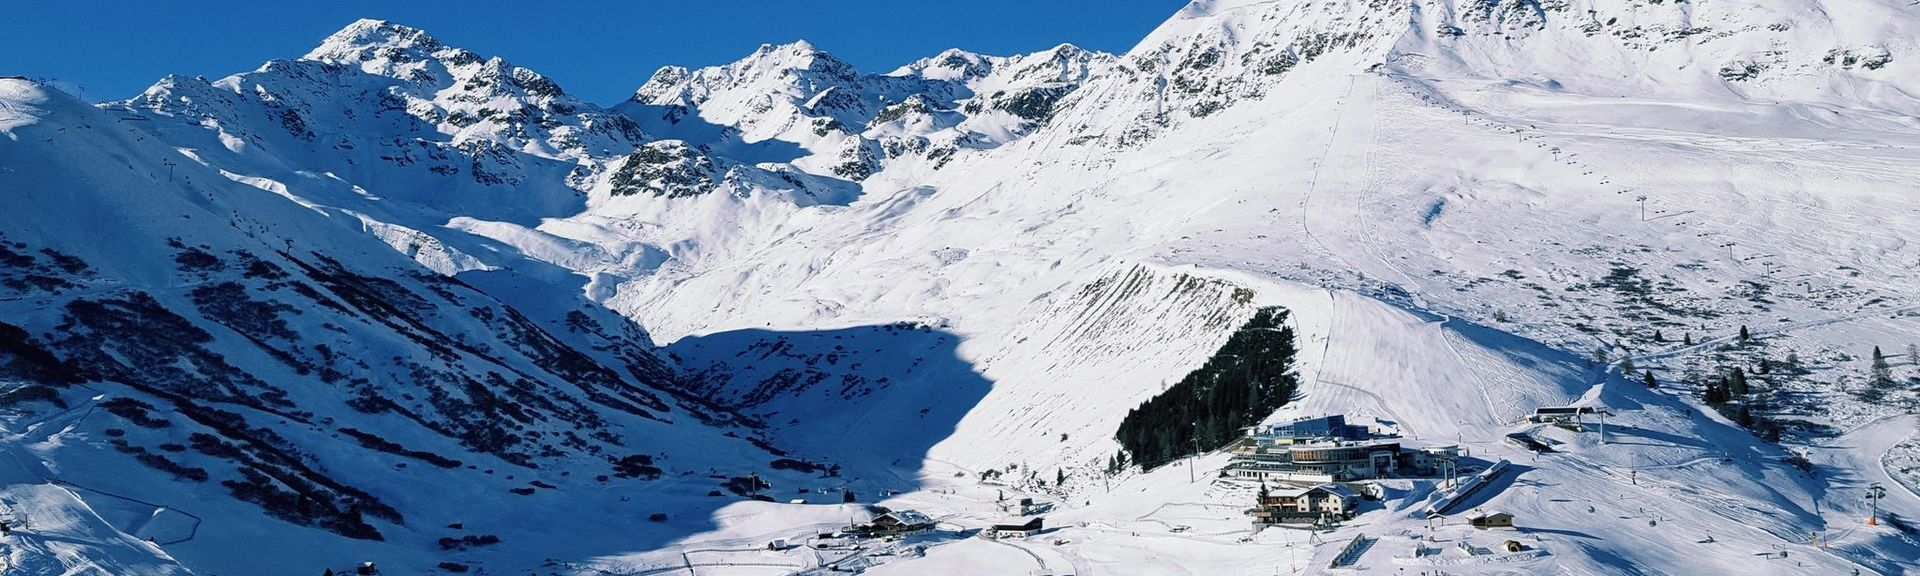 Skilift St. Christoph, Sankt Anton am Arlberg, Tirolo, Austria